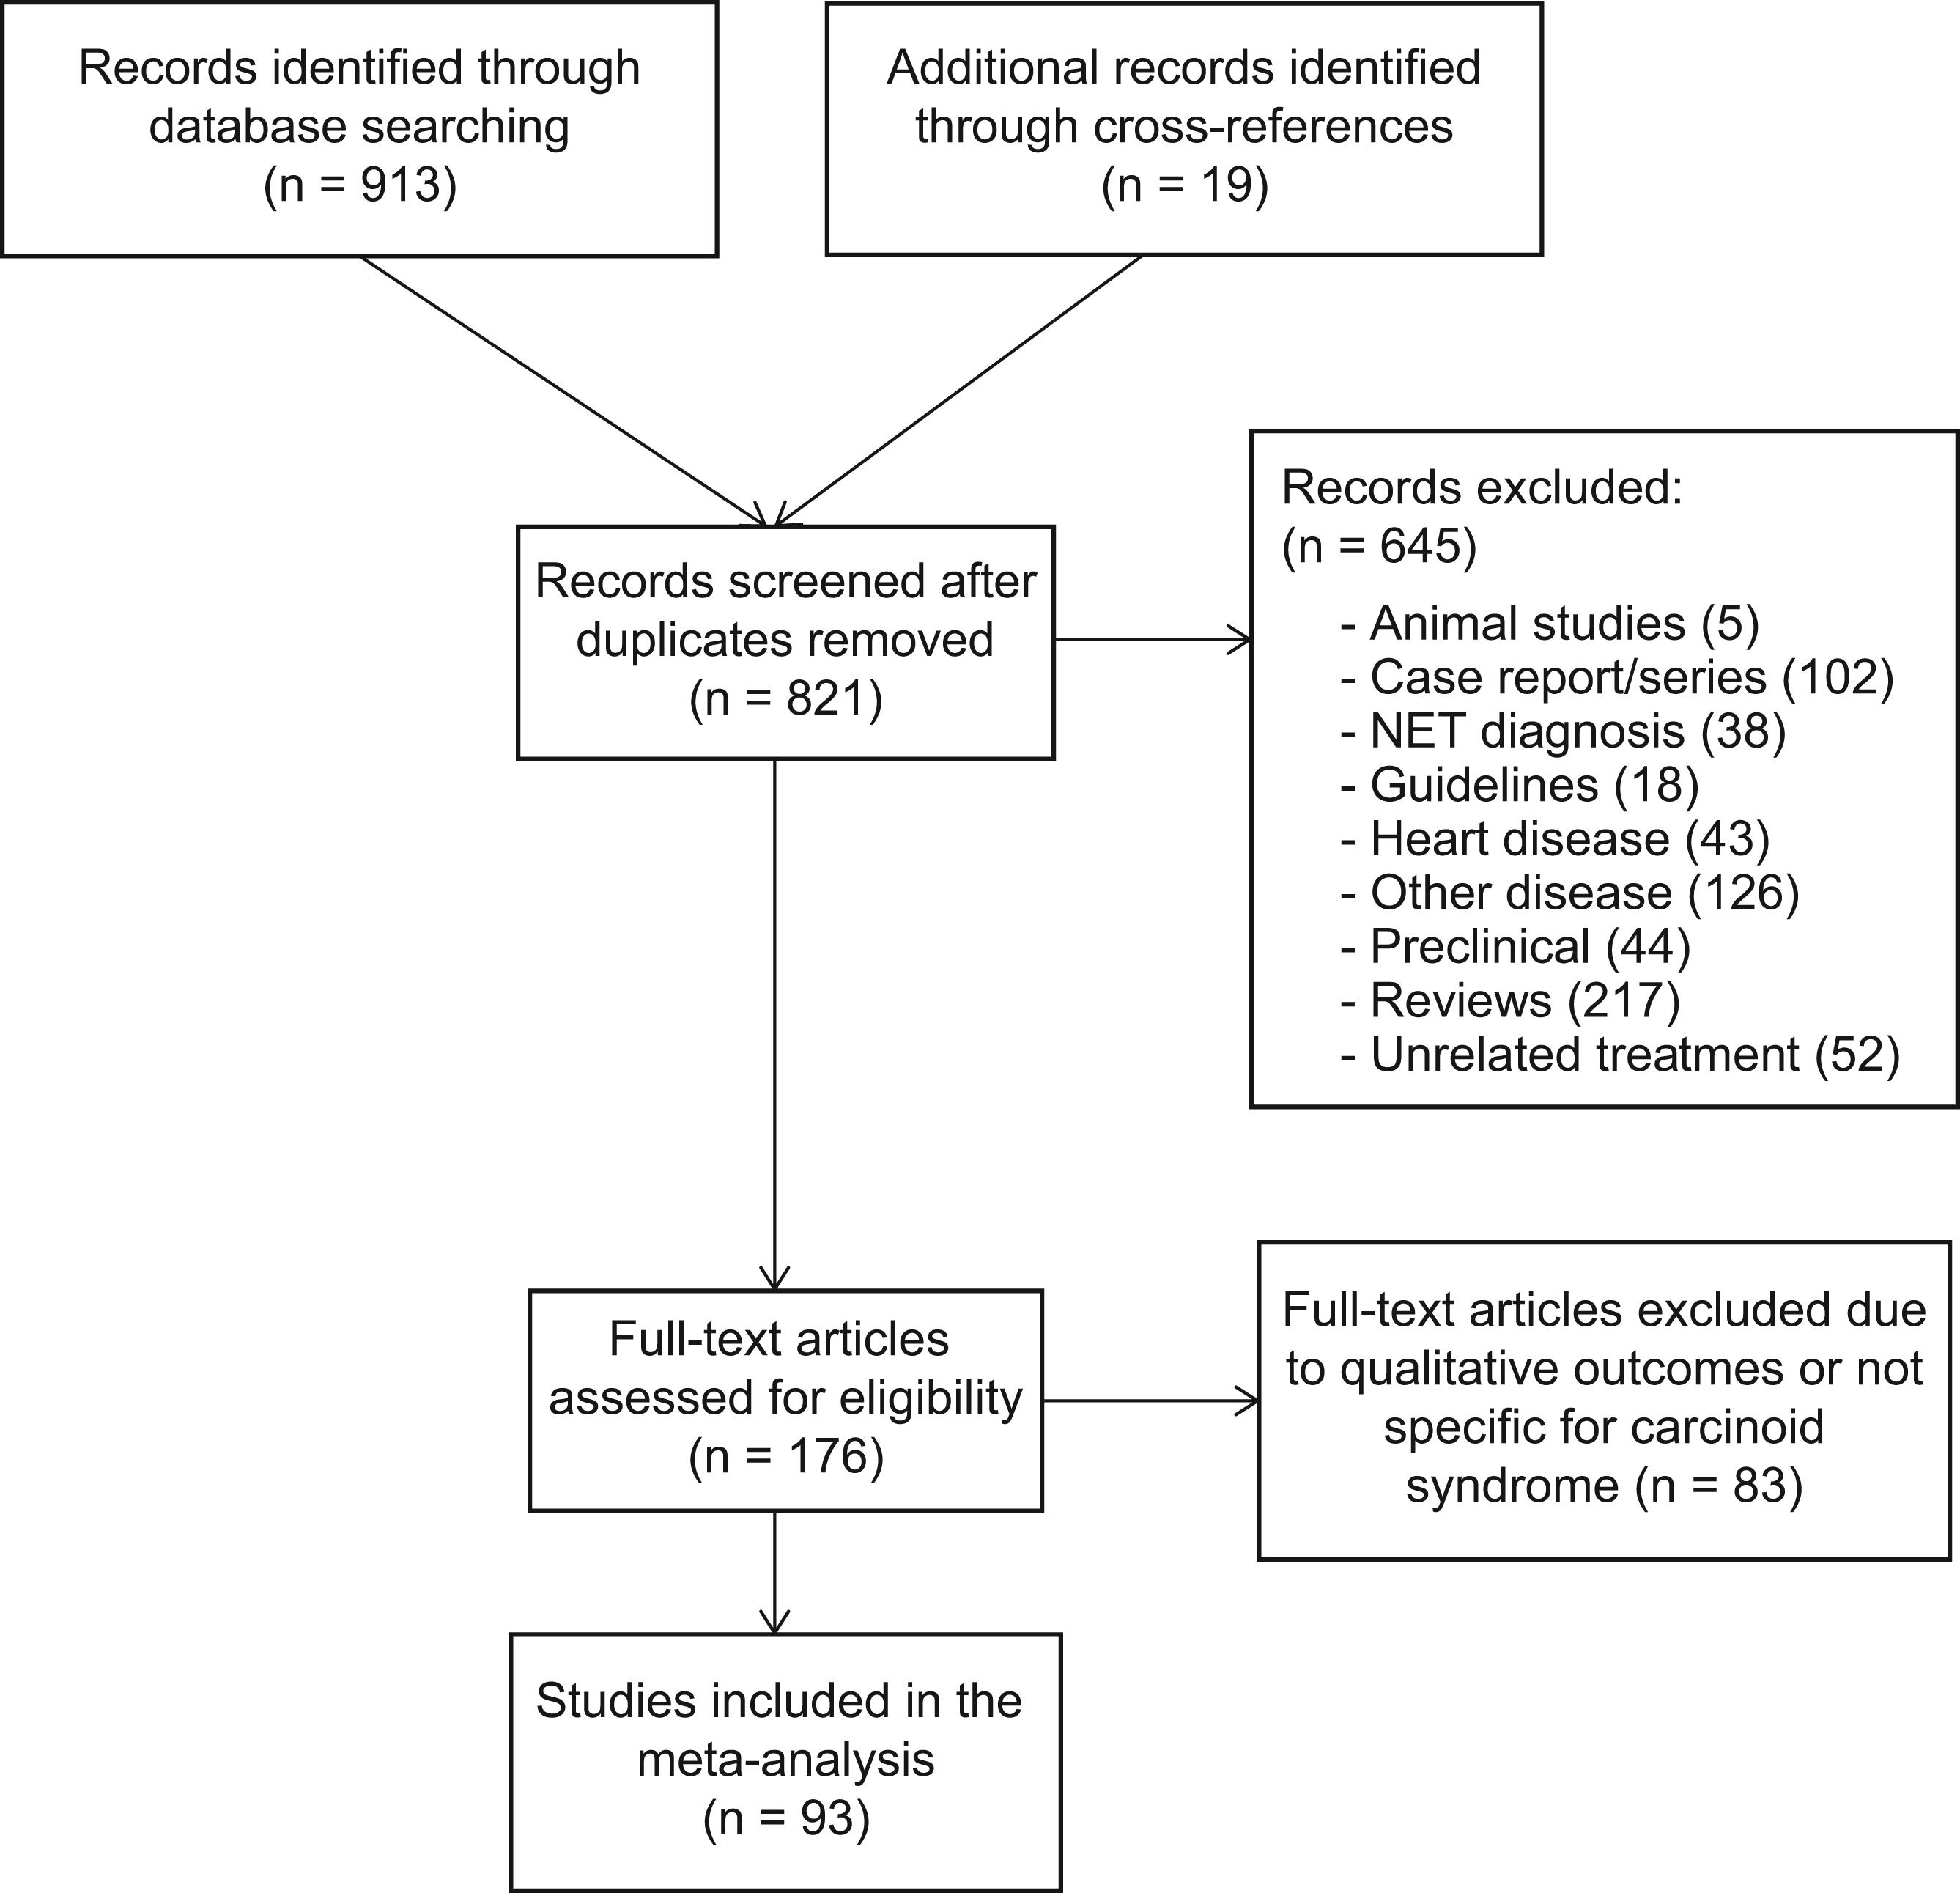 neuroendocrine cancer diarrhea)